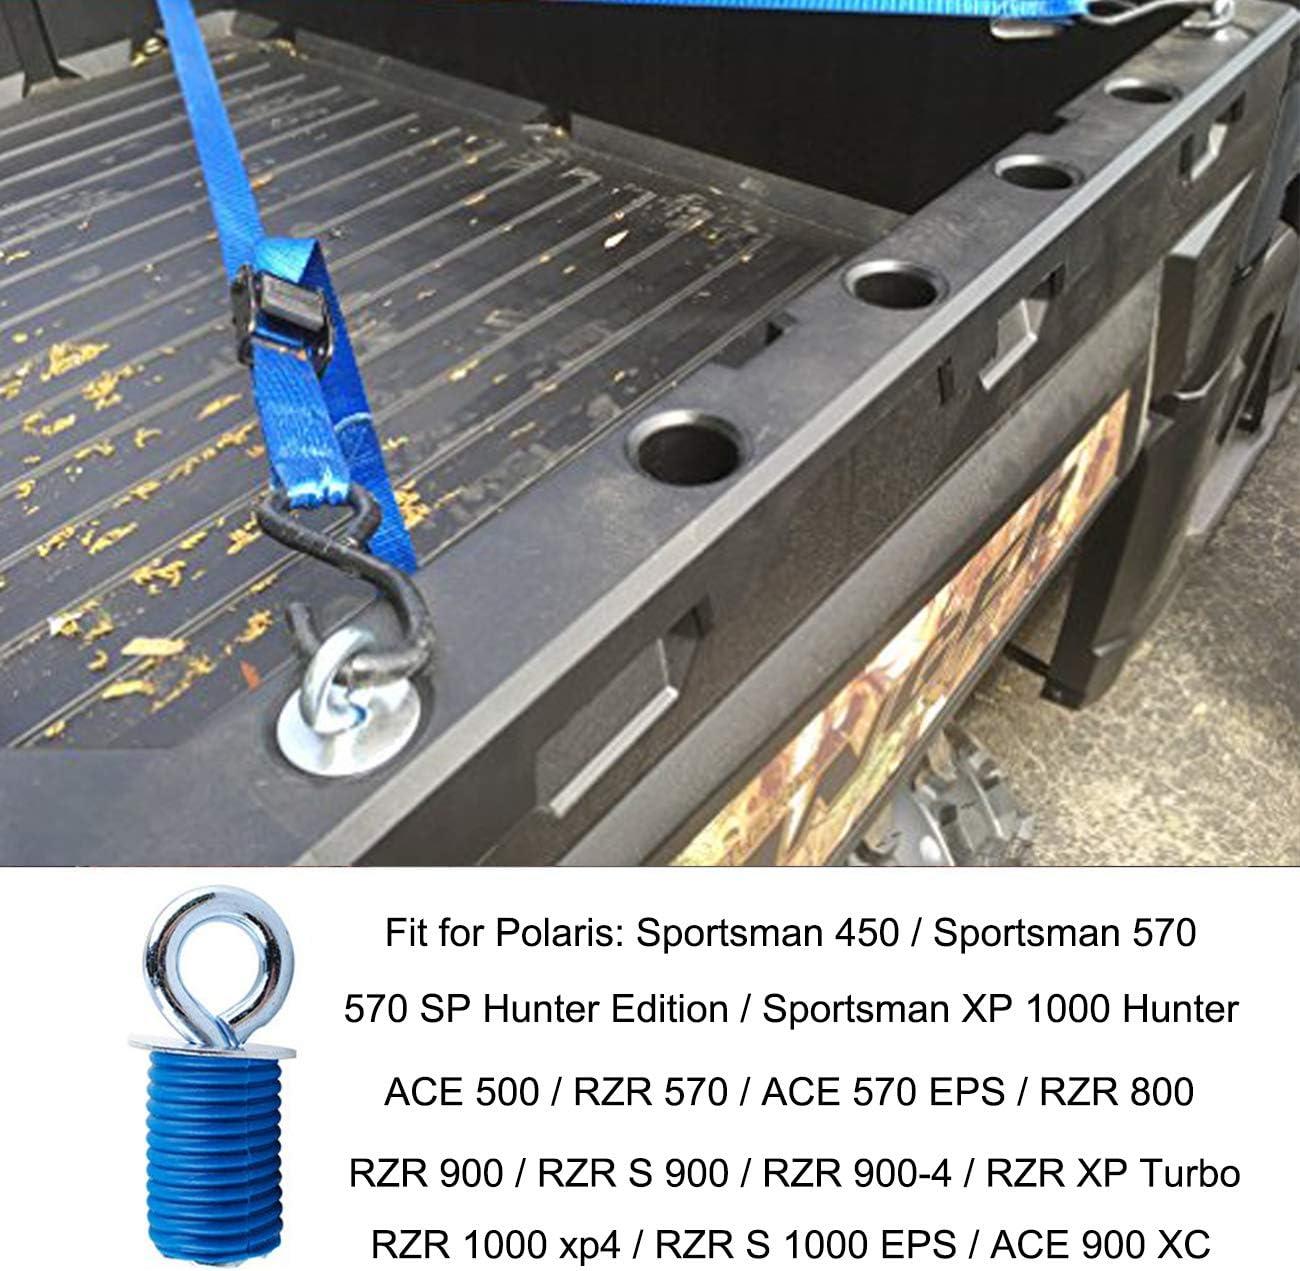 ALAVENTE ATV Anchors for Polaris Lock /& Ride ATV Tie Down Anchors for RZR Sportsman and Ace 6Pcs Twist /& Lock ATV Anchors